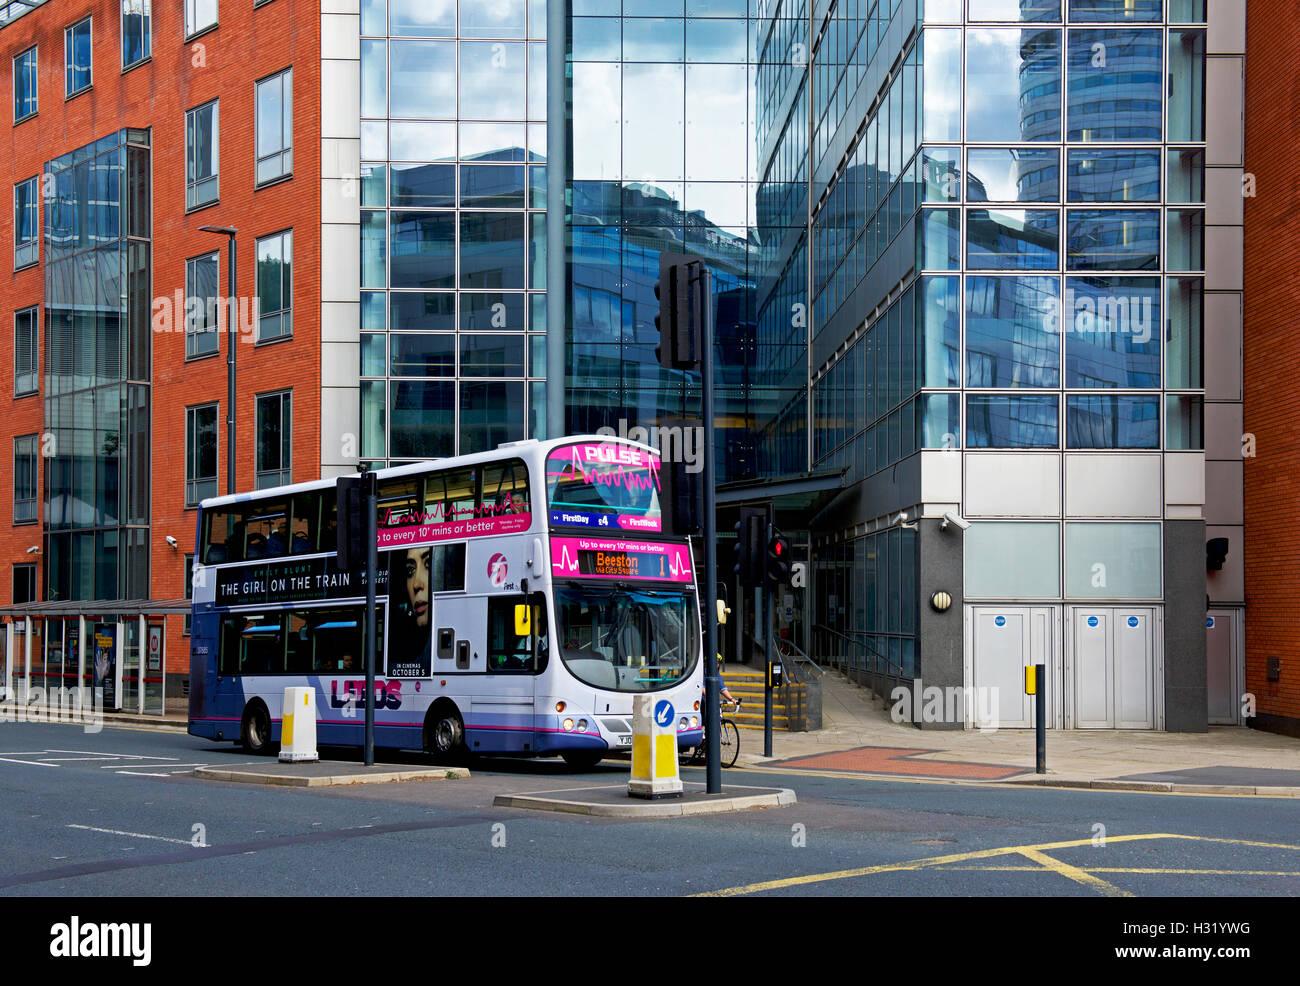 Double-decker bus on Neville Street, city centre, Leeds, West Yorkshire - Stock Image